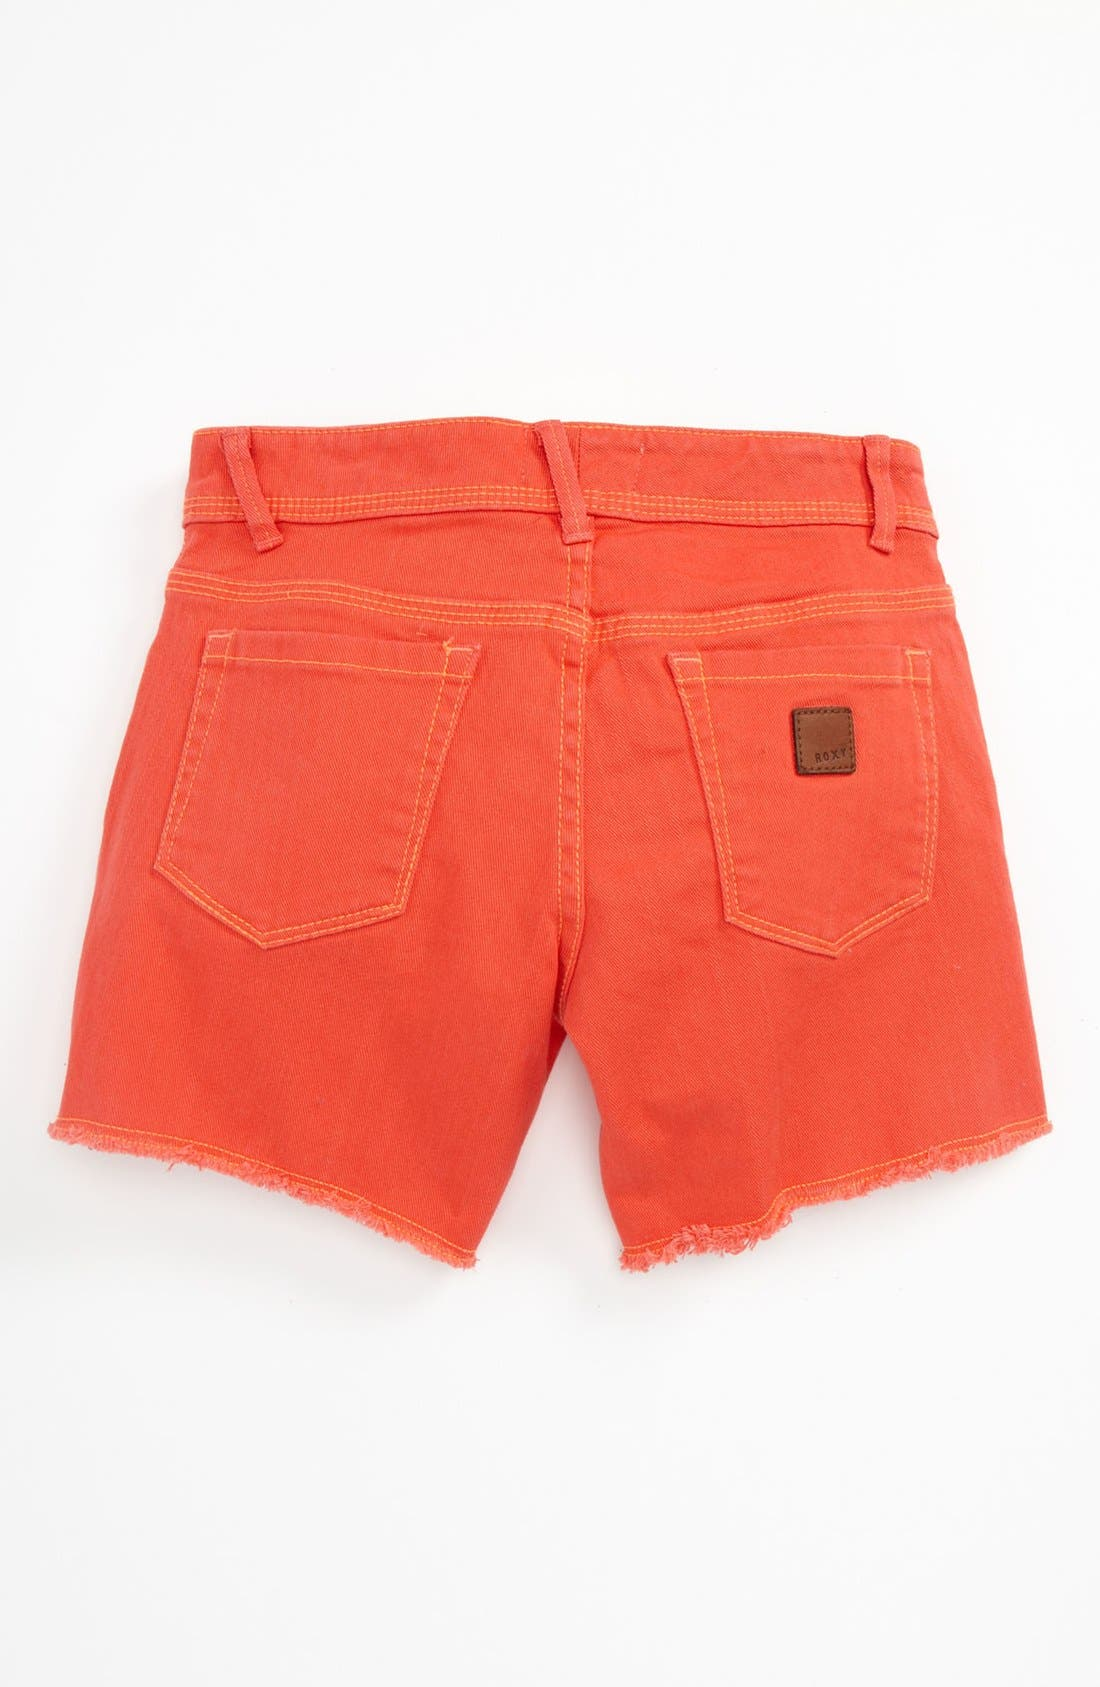 Alternate Image 1 Selected - Roxy 'Long Trippers' Bermuda Shorts (Big Girls)